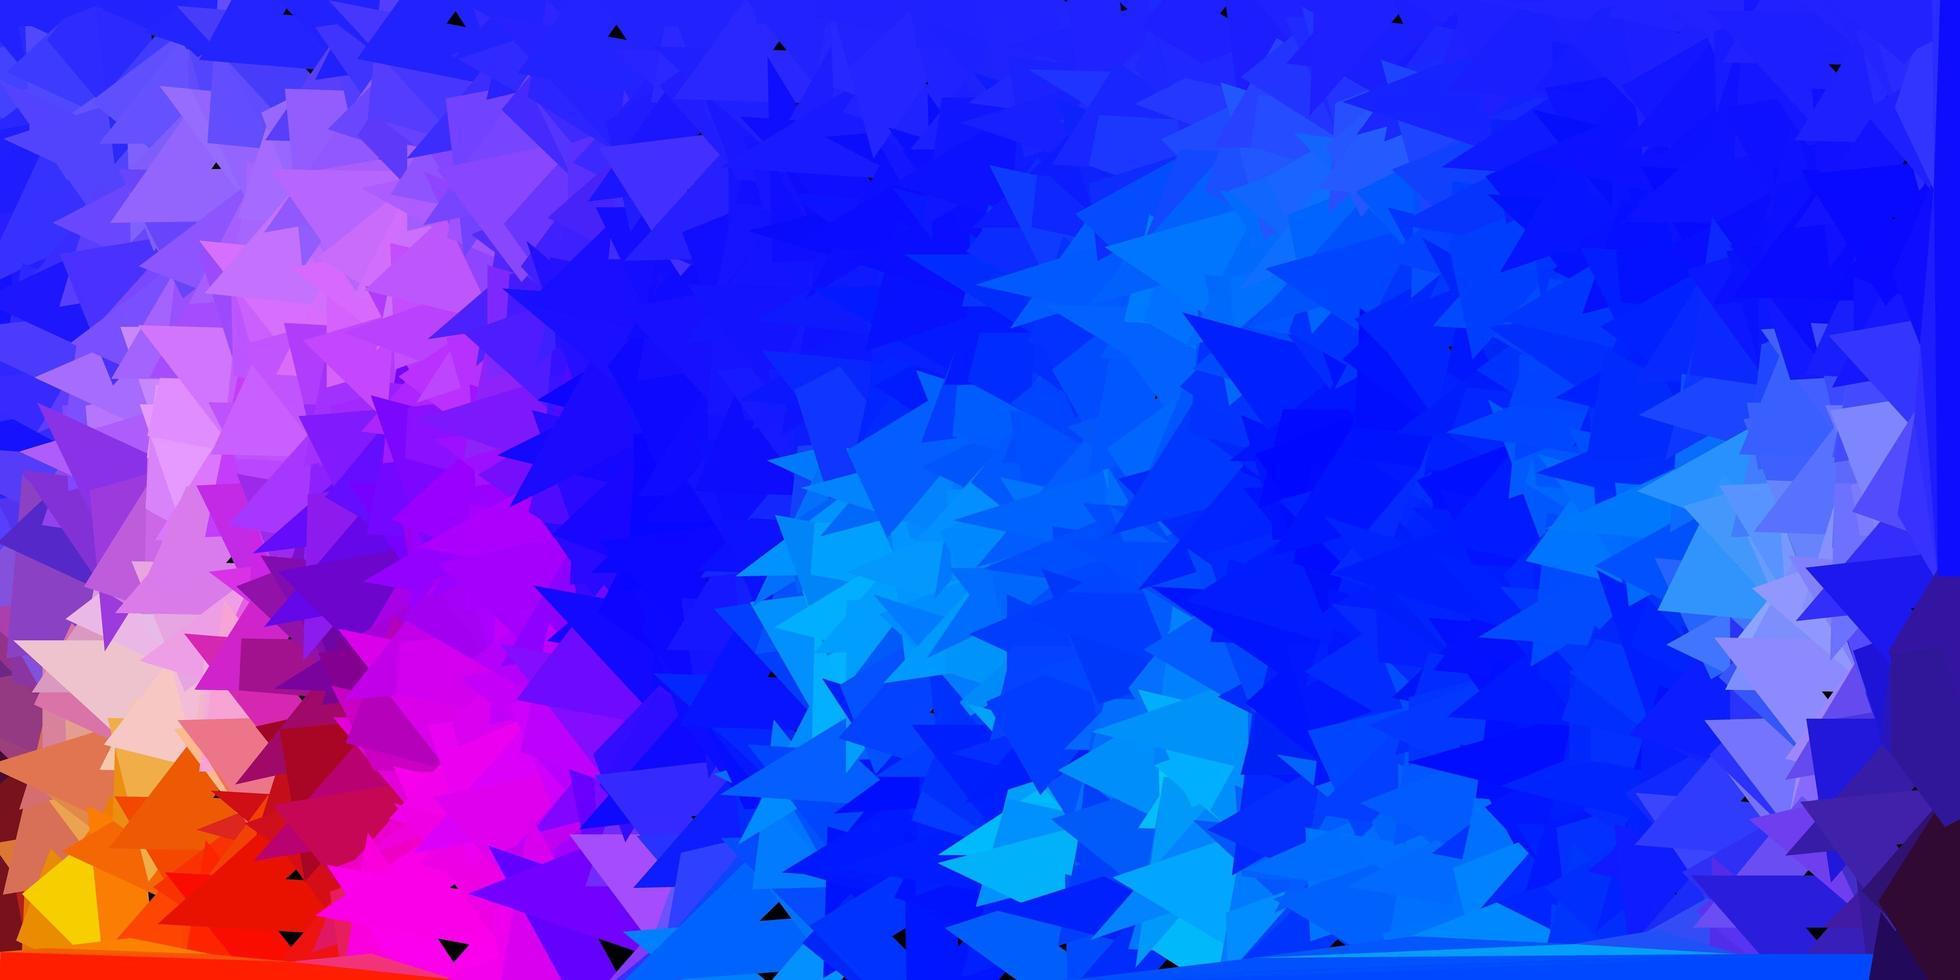 modelo de mosaico de triângulo de vetor multicolorido claro